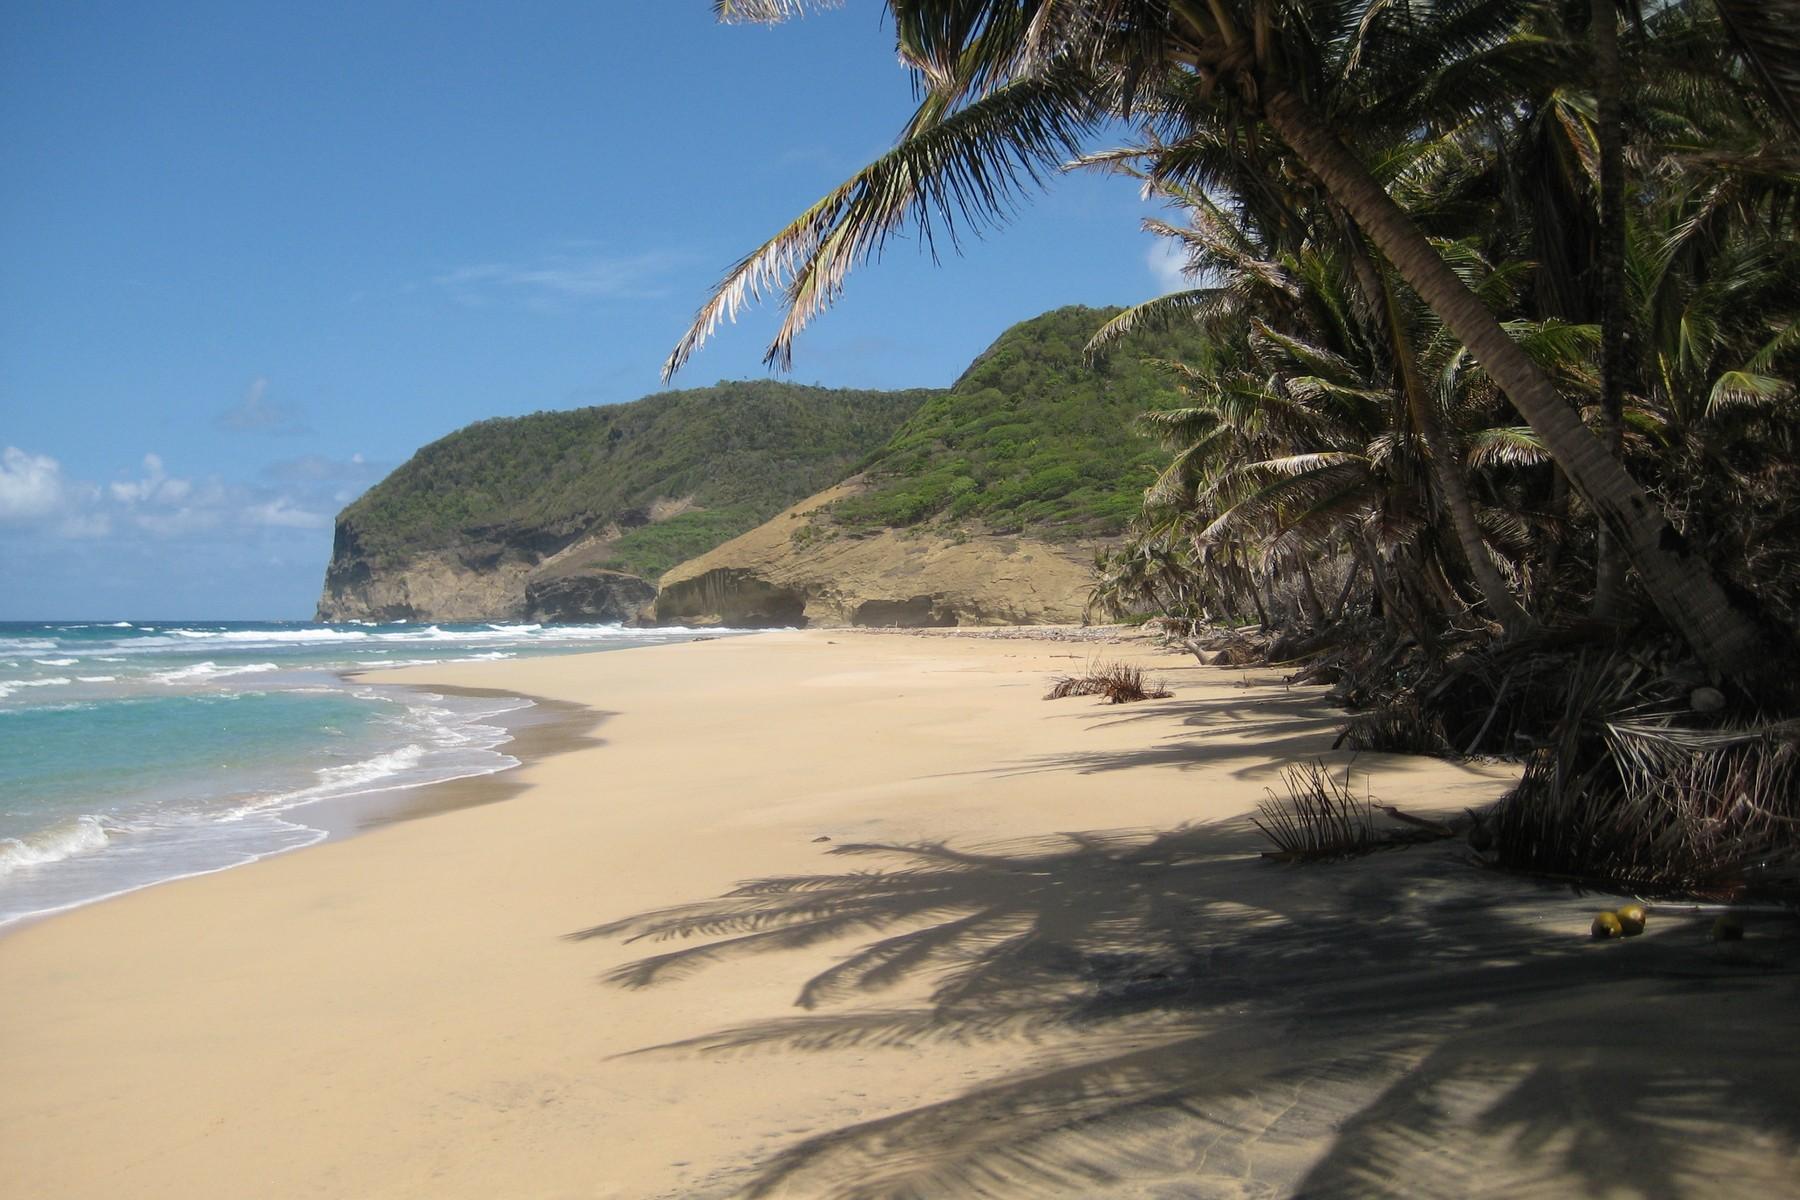 Đất đai vì Bán tại Gros Islet, Gros-Islet St. Lucia